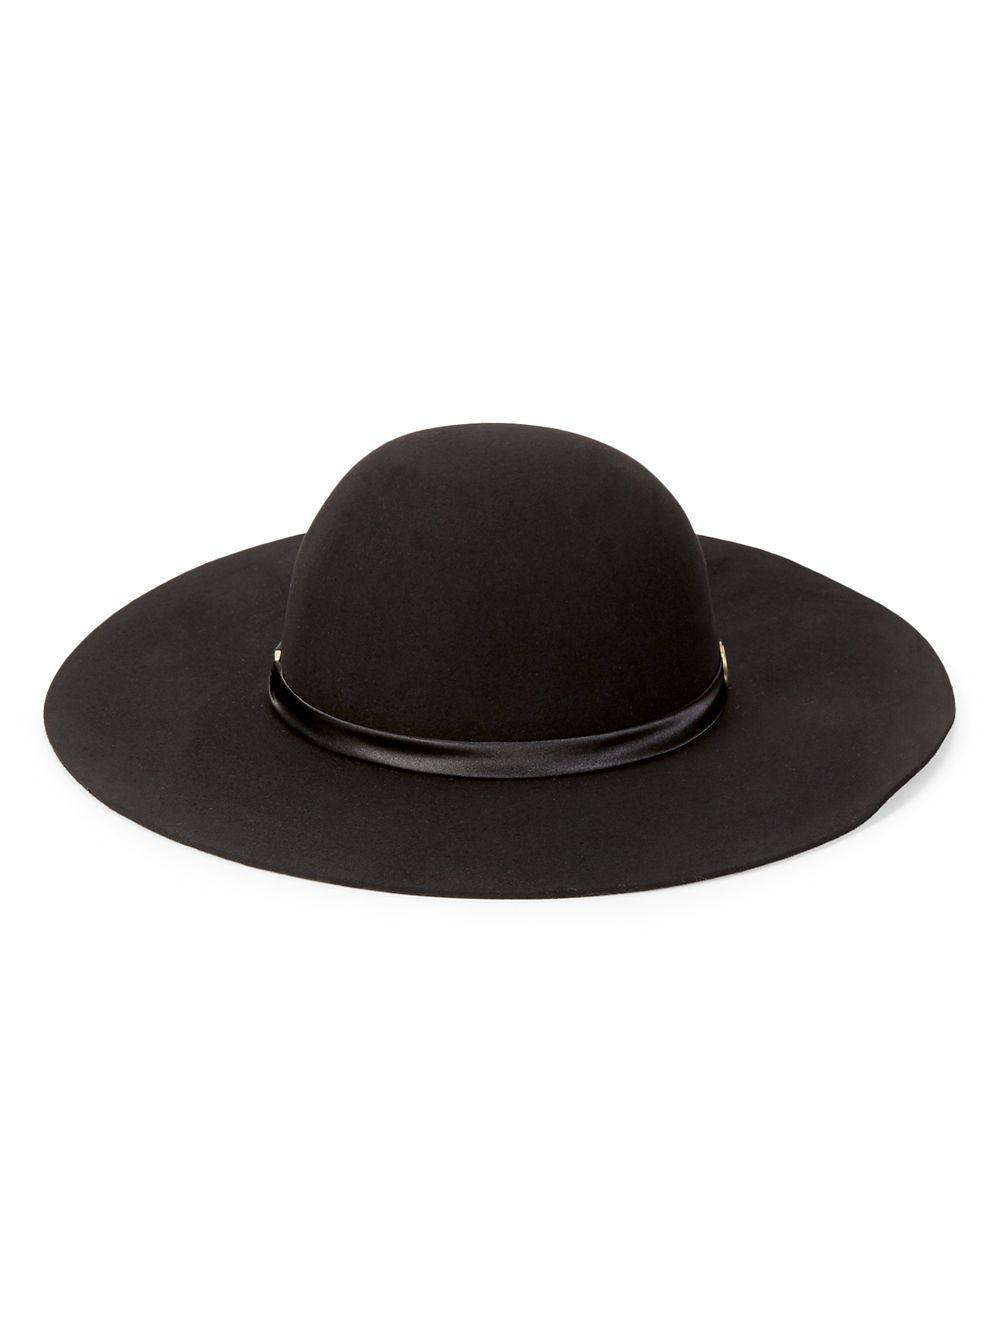 0527ae9dbe4 Lyst - Vince Camuto Floppy Wool Hat in Black